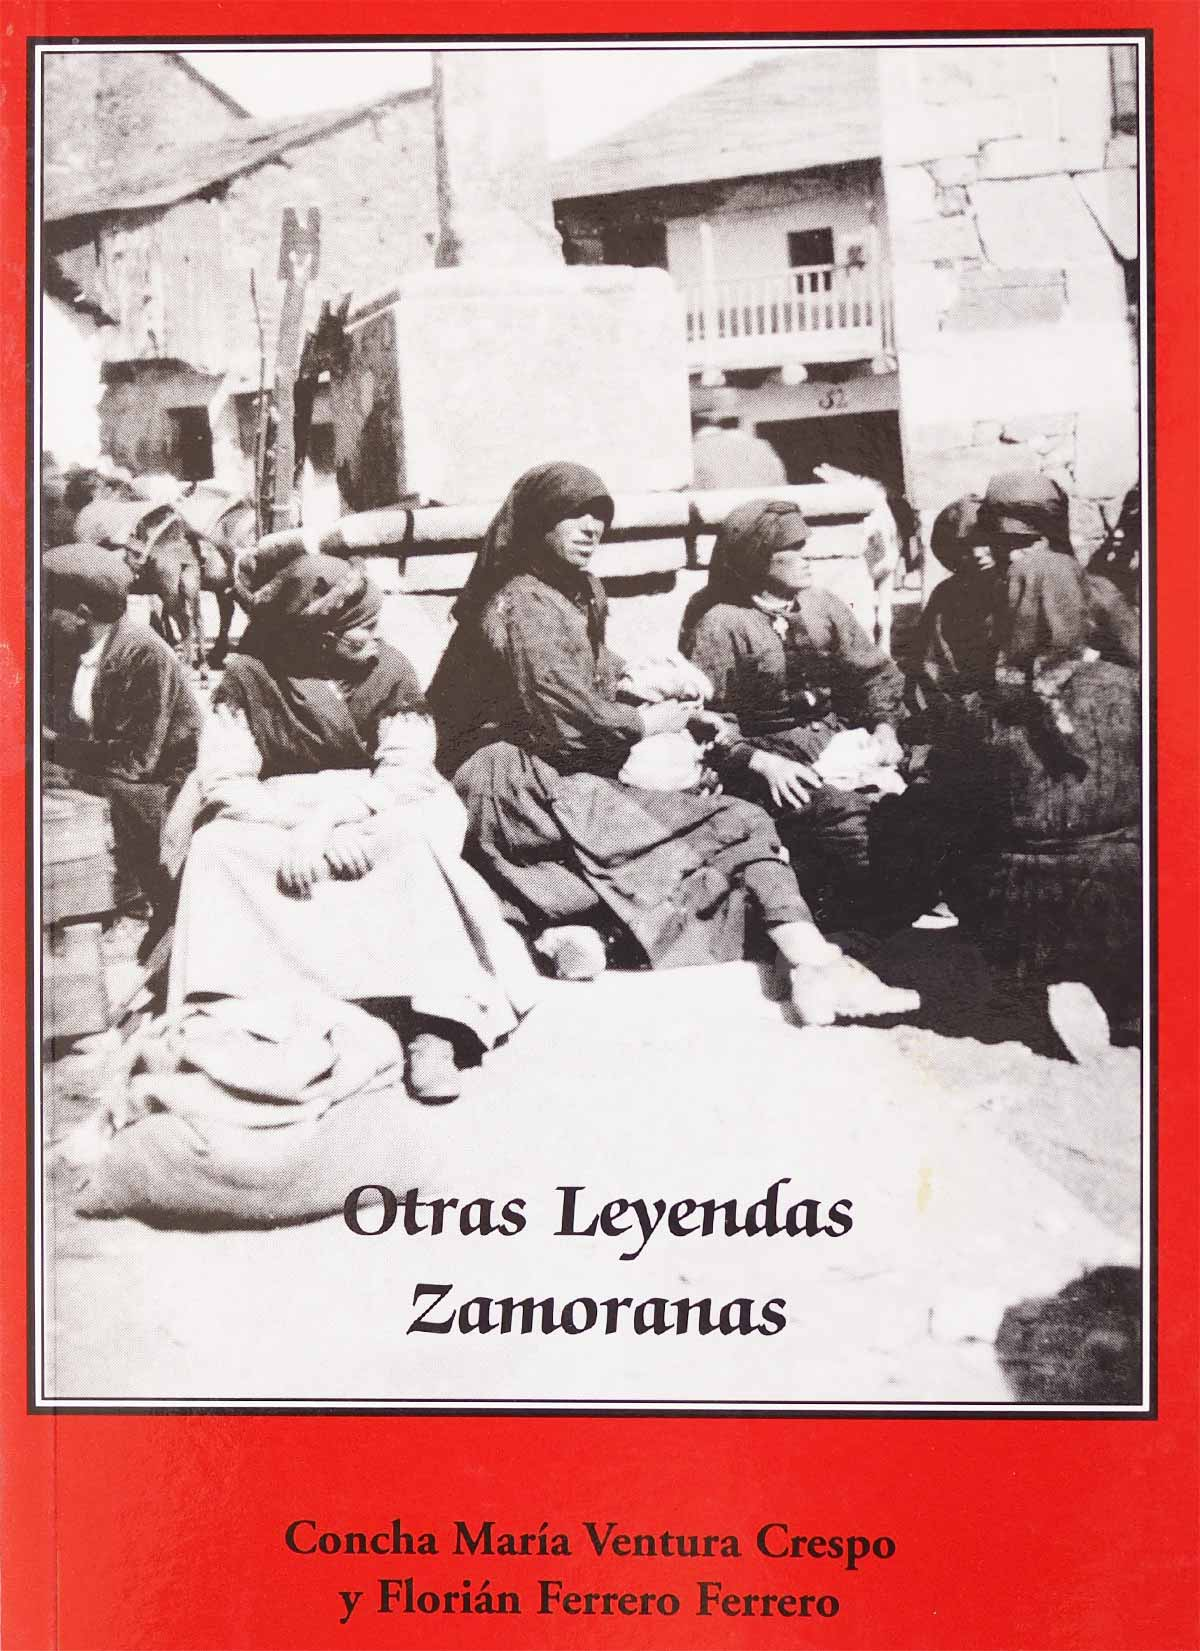 Editorial Semuret Otras Leyendas Zamoranas Concha Maria Ventura Crespo Florián Ferrero Ferrero